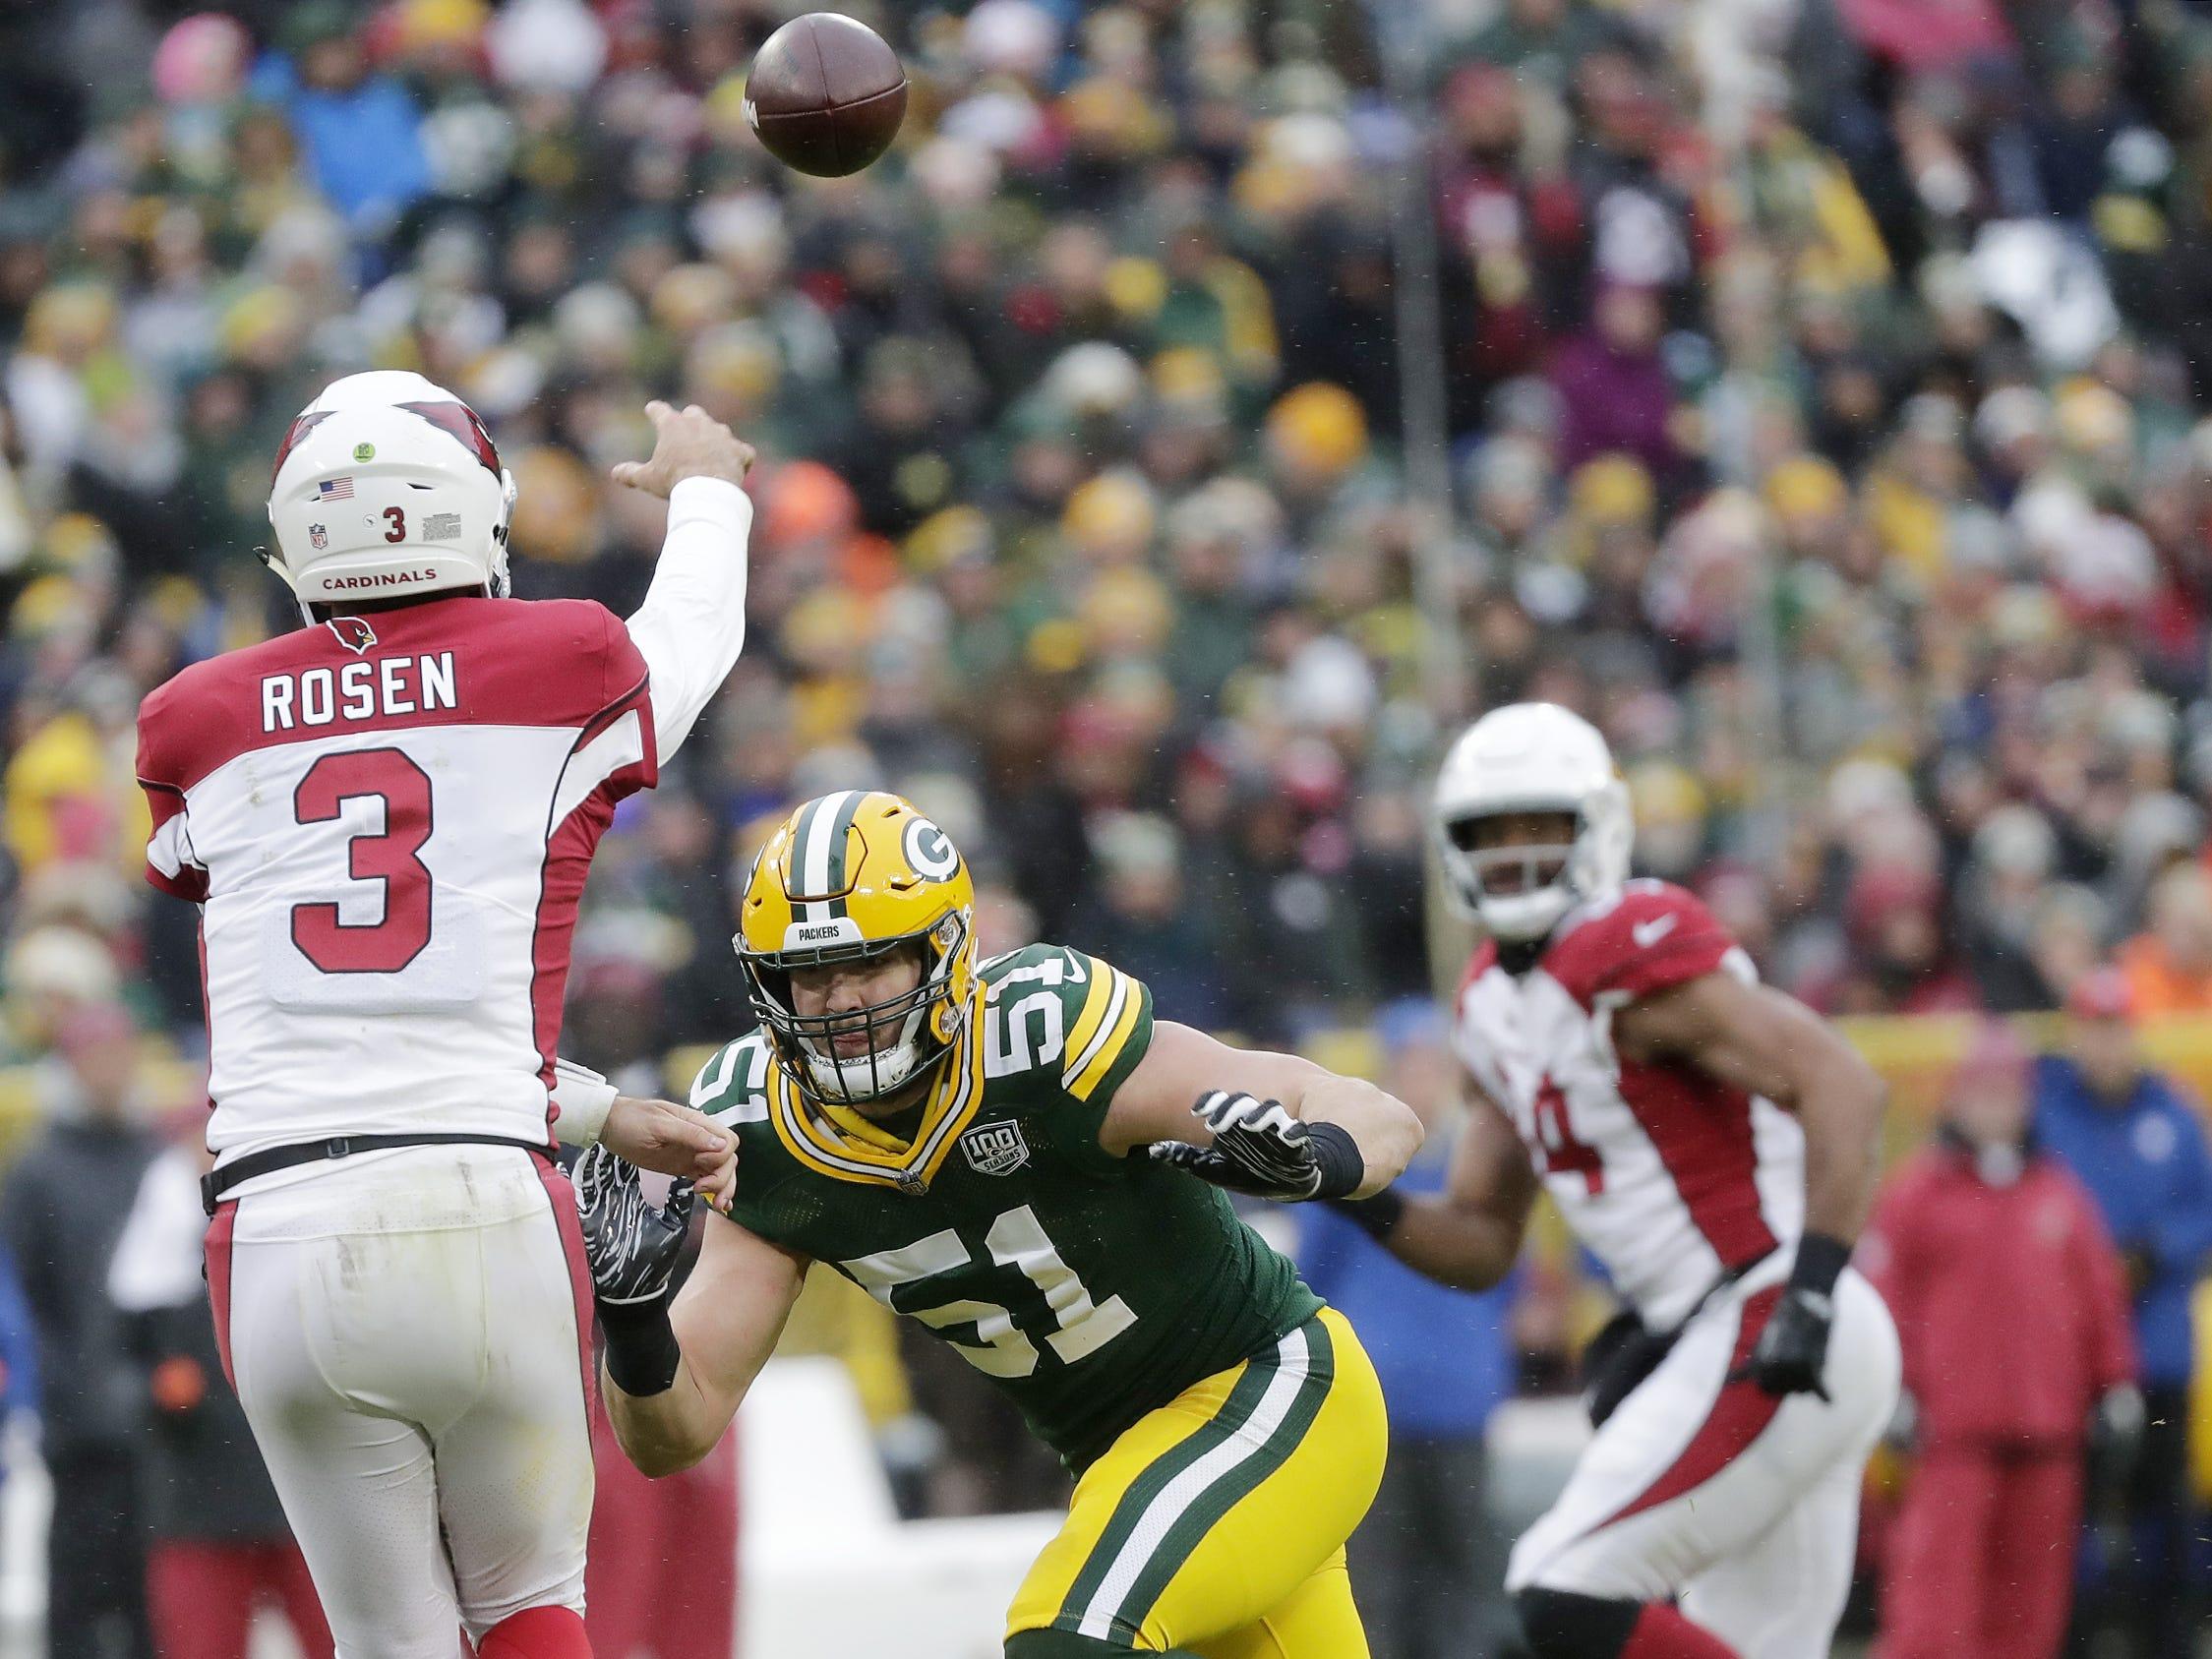 Green Bay Packers linebacker Kyler Fackrell (51) pressures Arizona Cardinals quarterback Josh Rosen (3) in the fourth quarter at Lambeau Field on Sunday, December 2, 2018 in Green Bay, Wis.